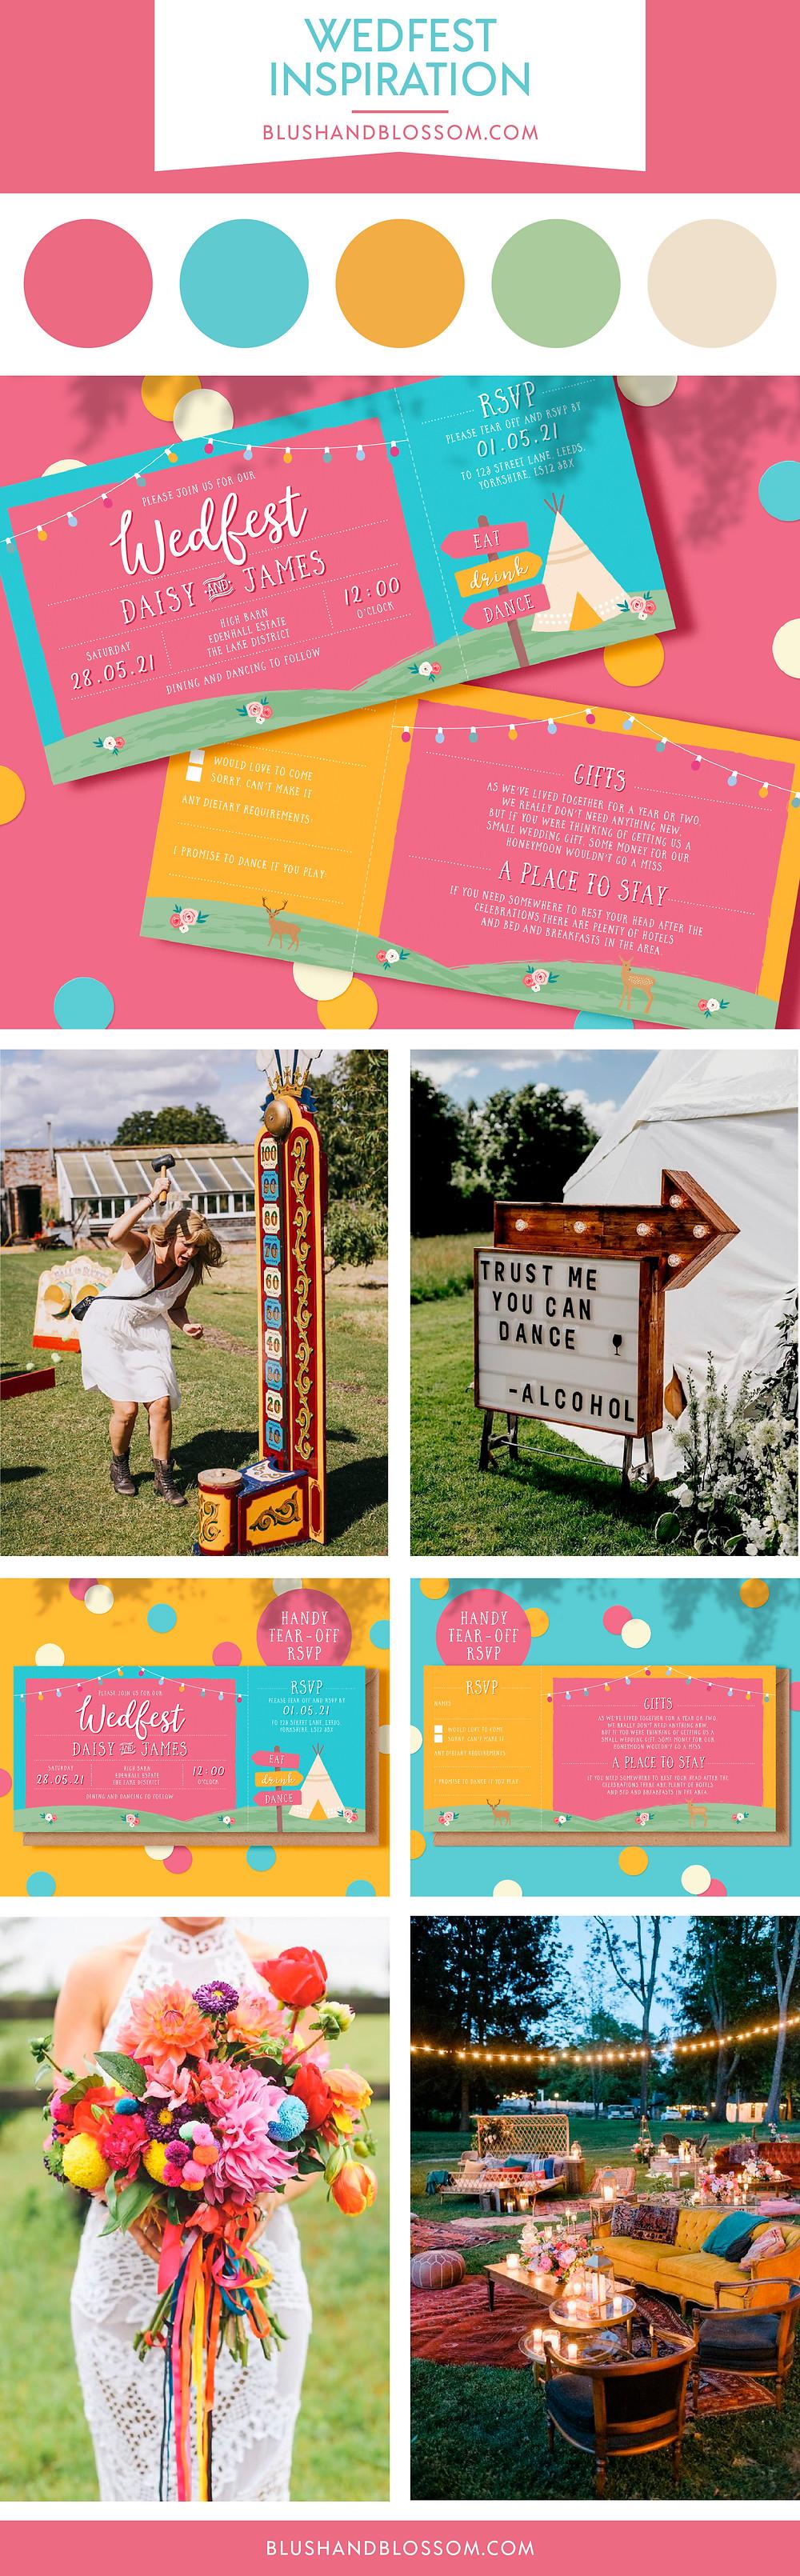 Wedfest festival wedding inspiration and fun ideas